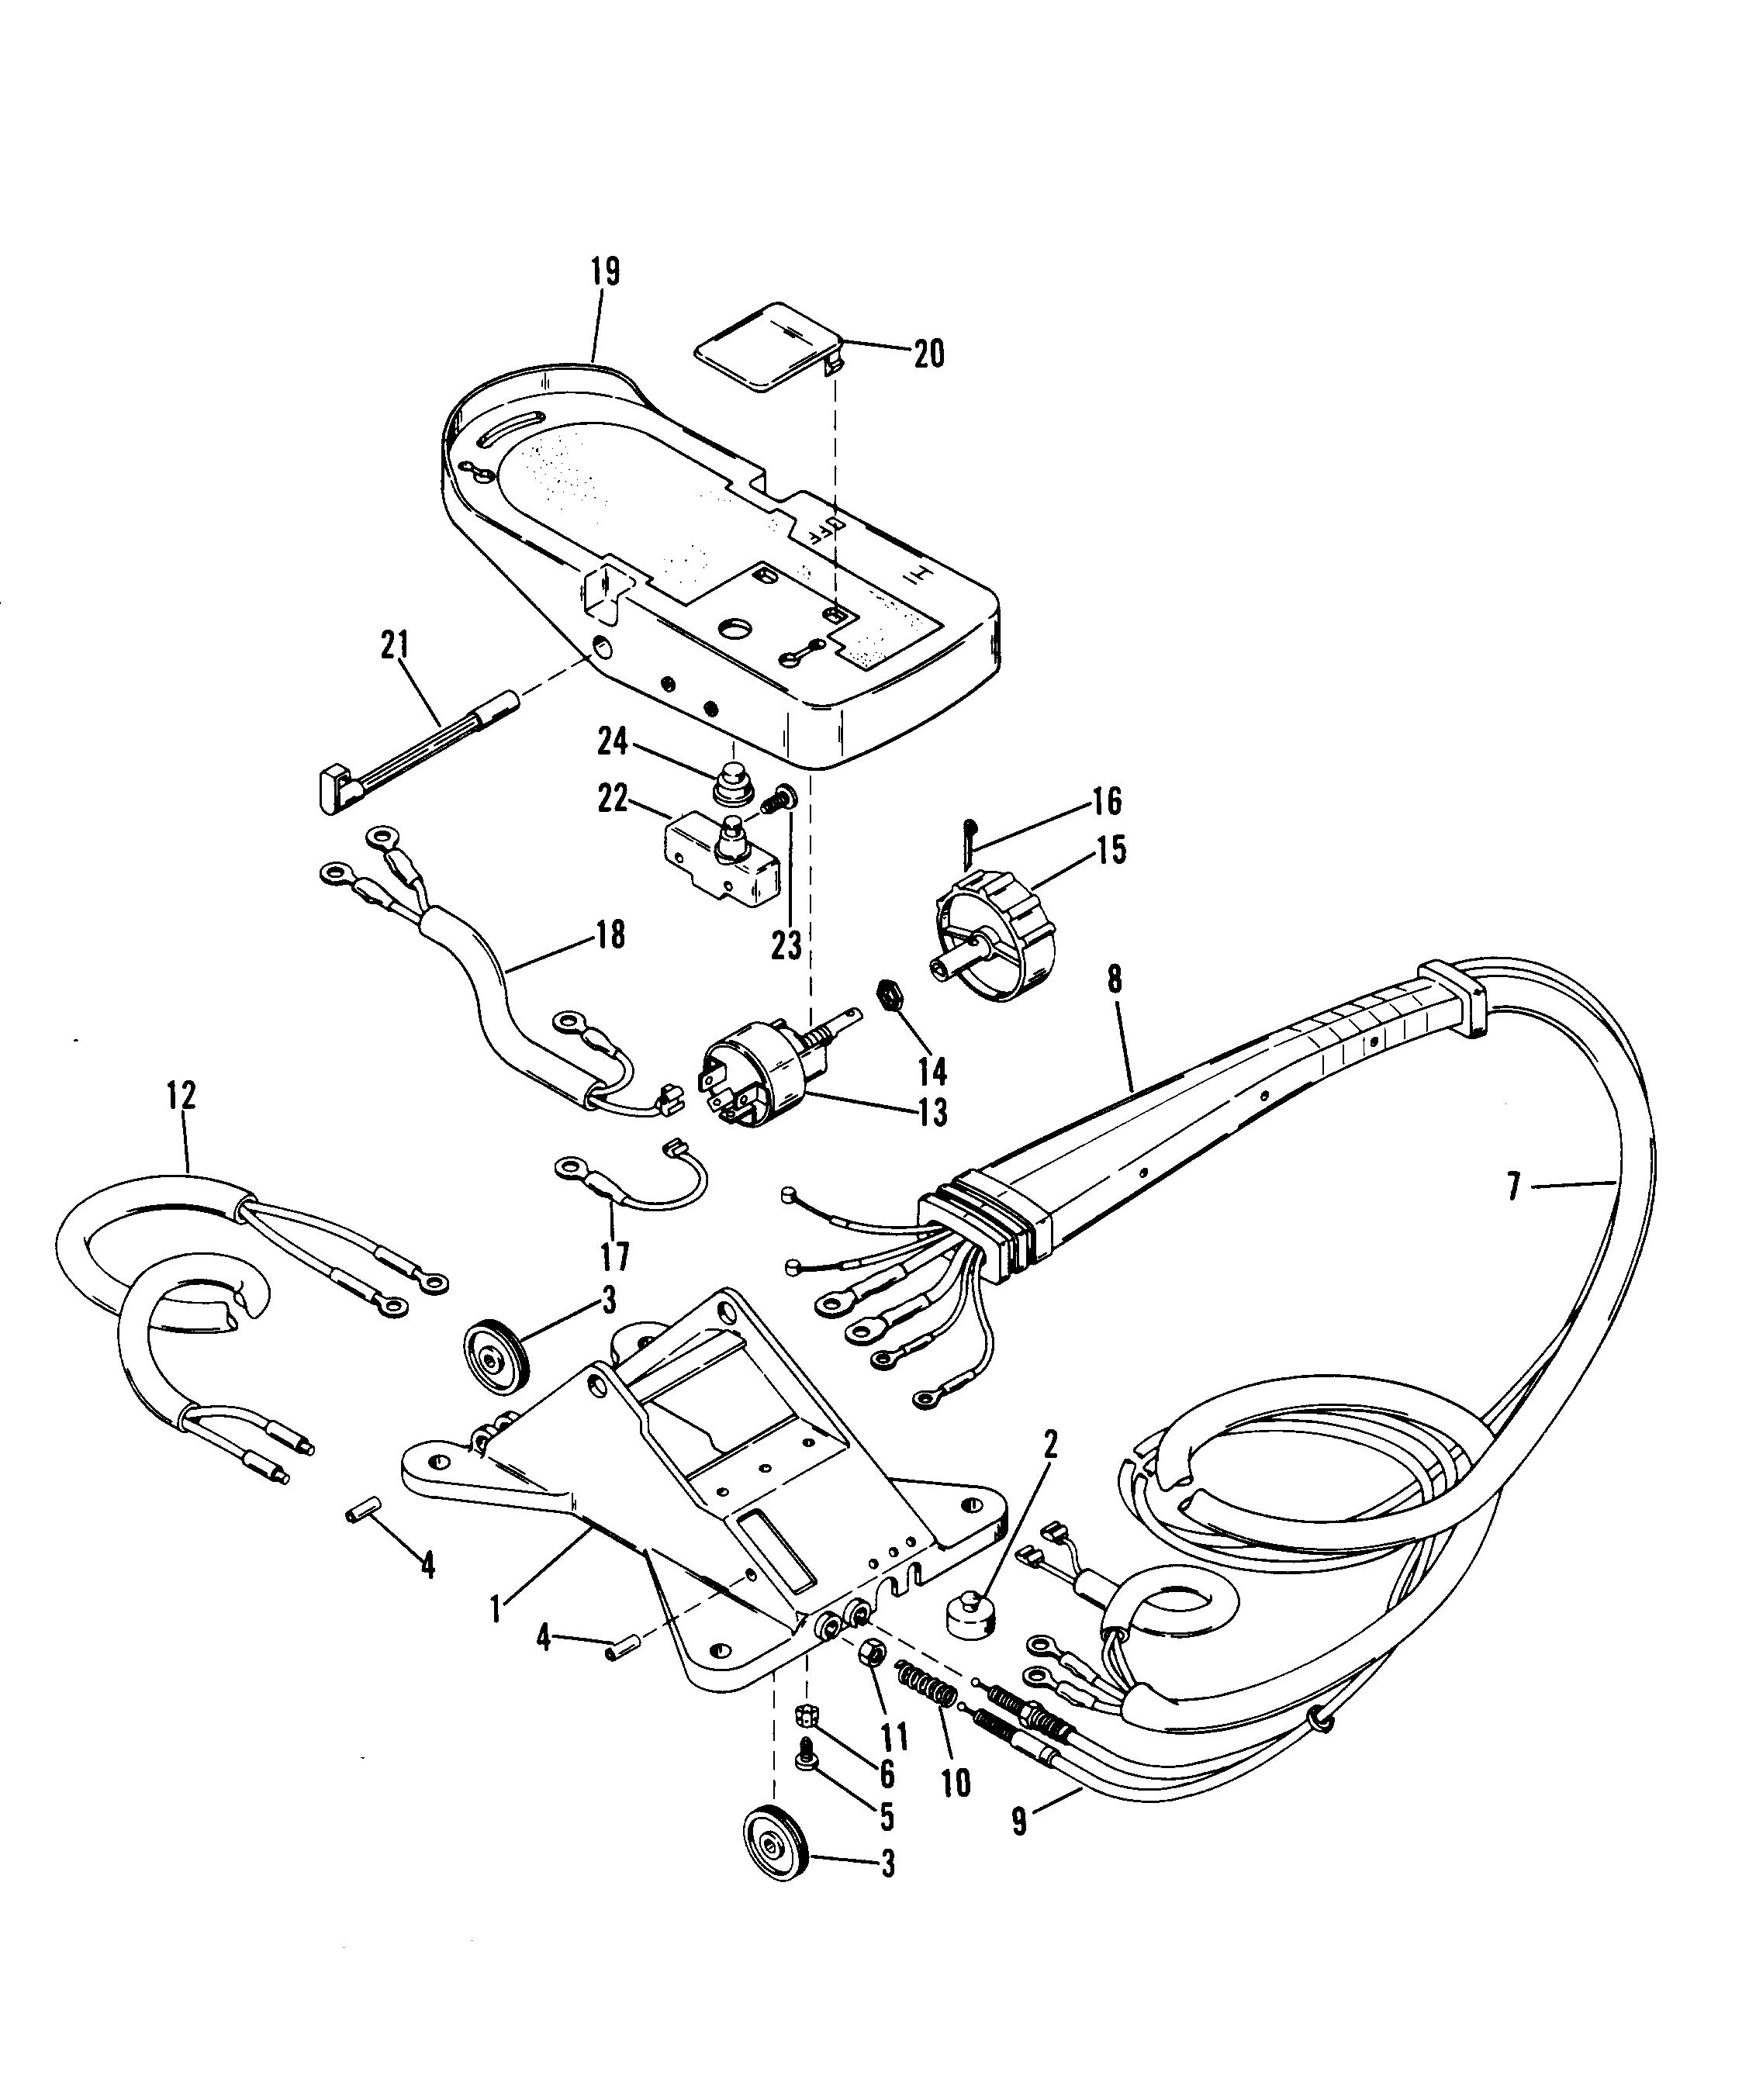 9ct63lqax Trolling Motorguide Wiring Diagram